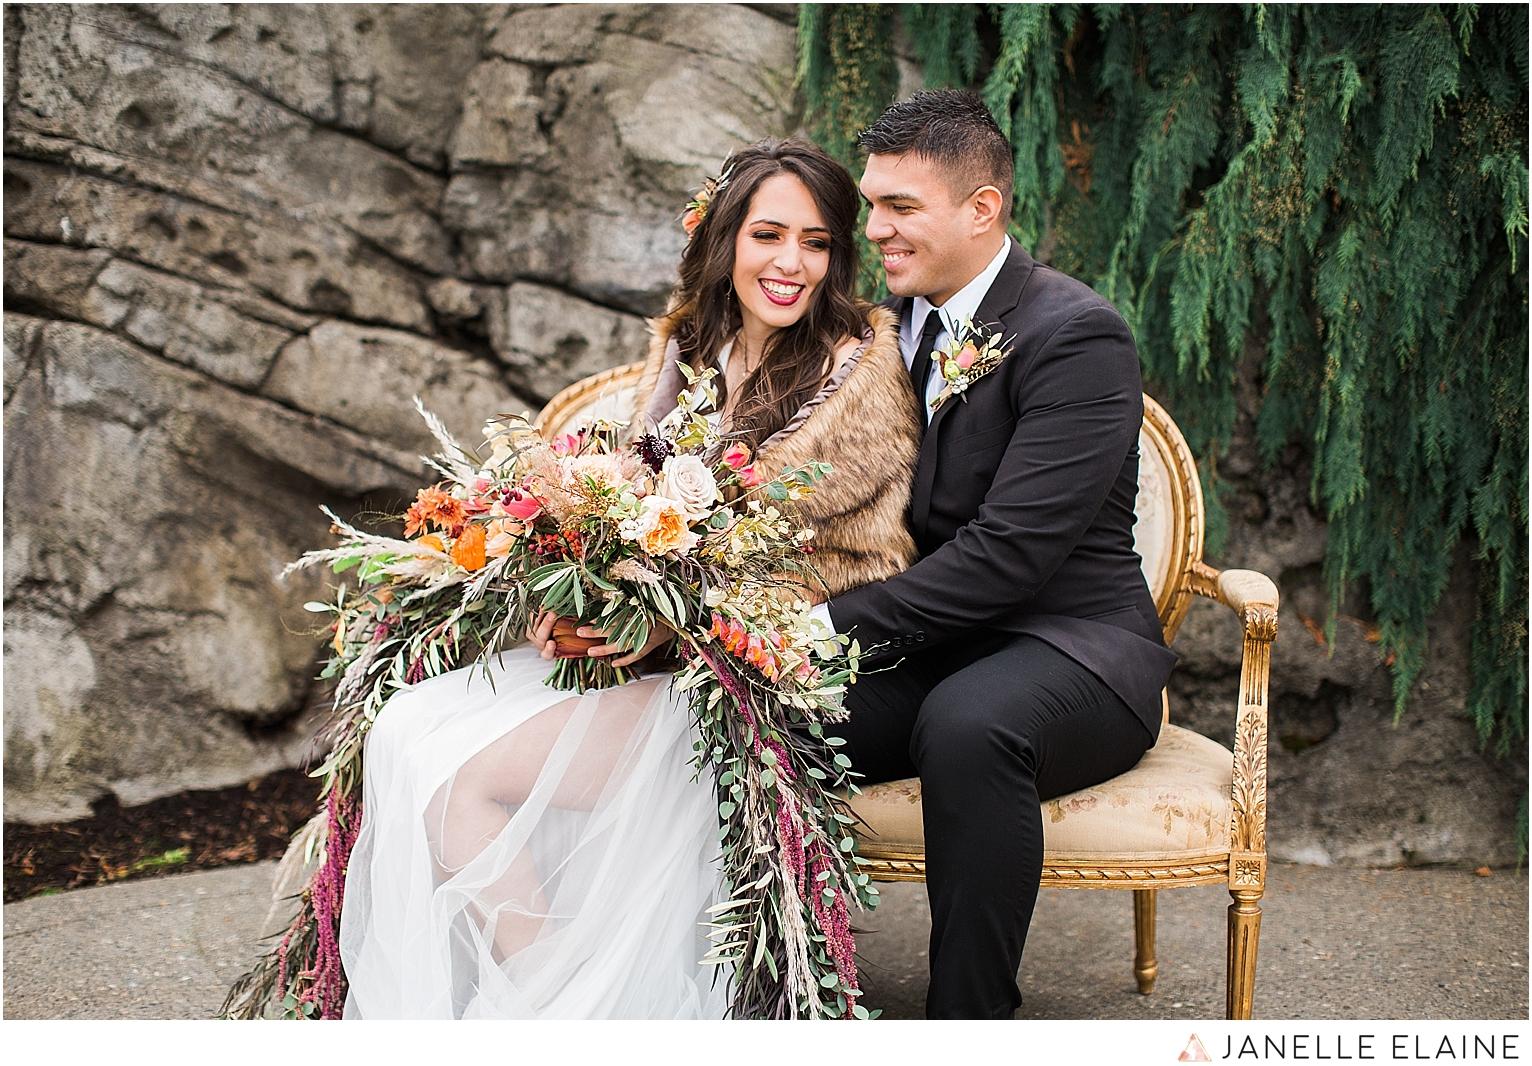 elopement-wedding-photographer-seattle washington-photographers-55.jpg